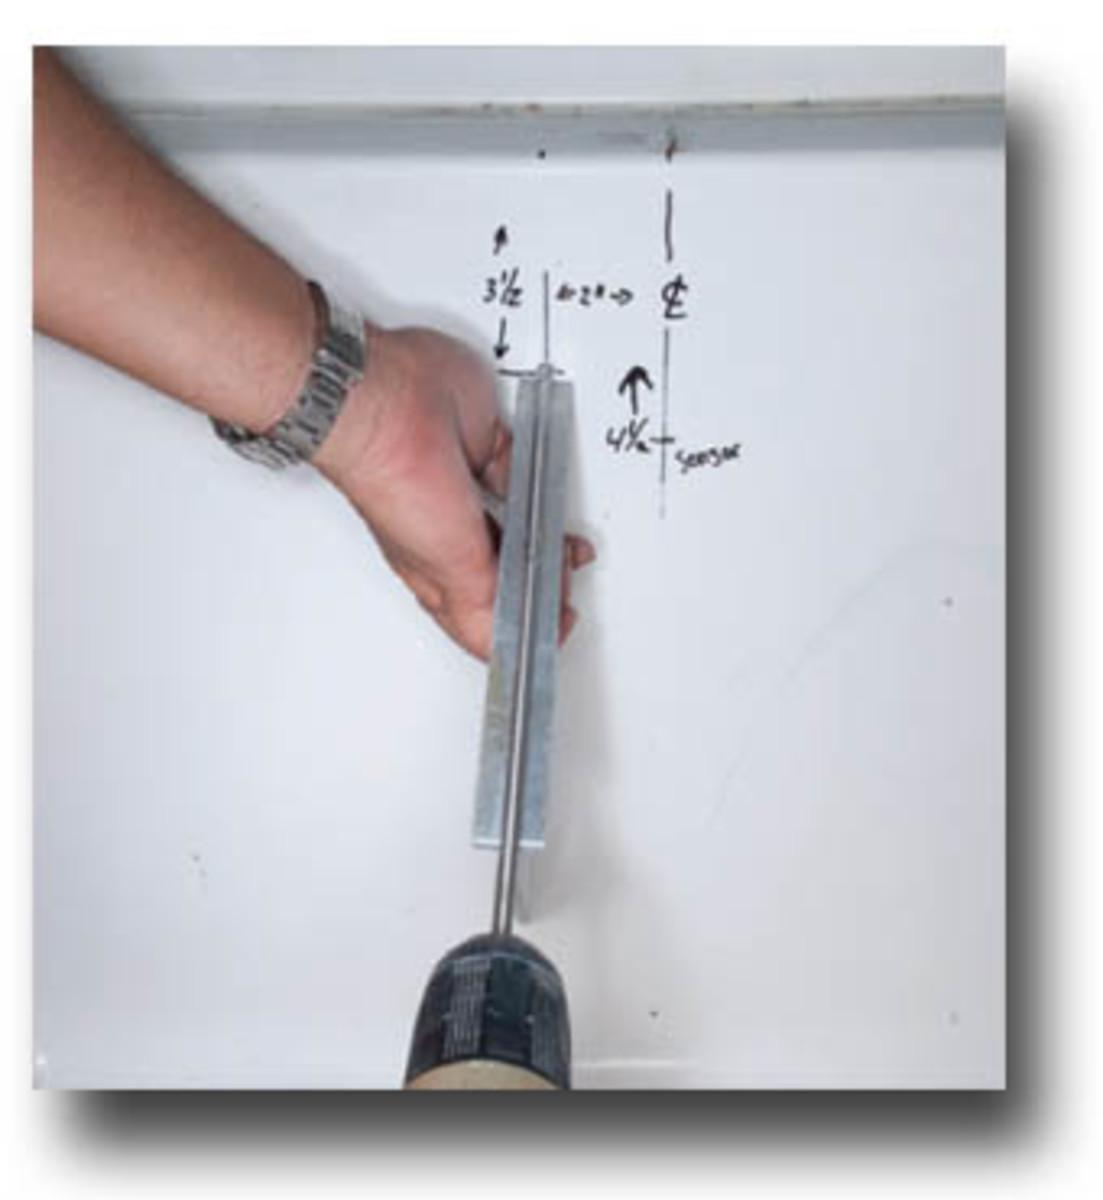 Installing An Ice Maker - 5